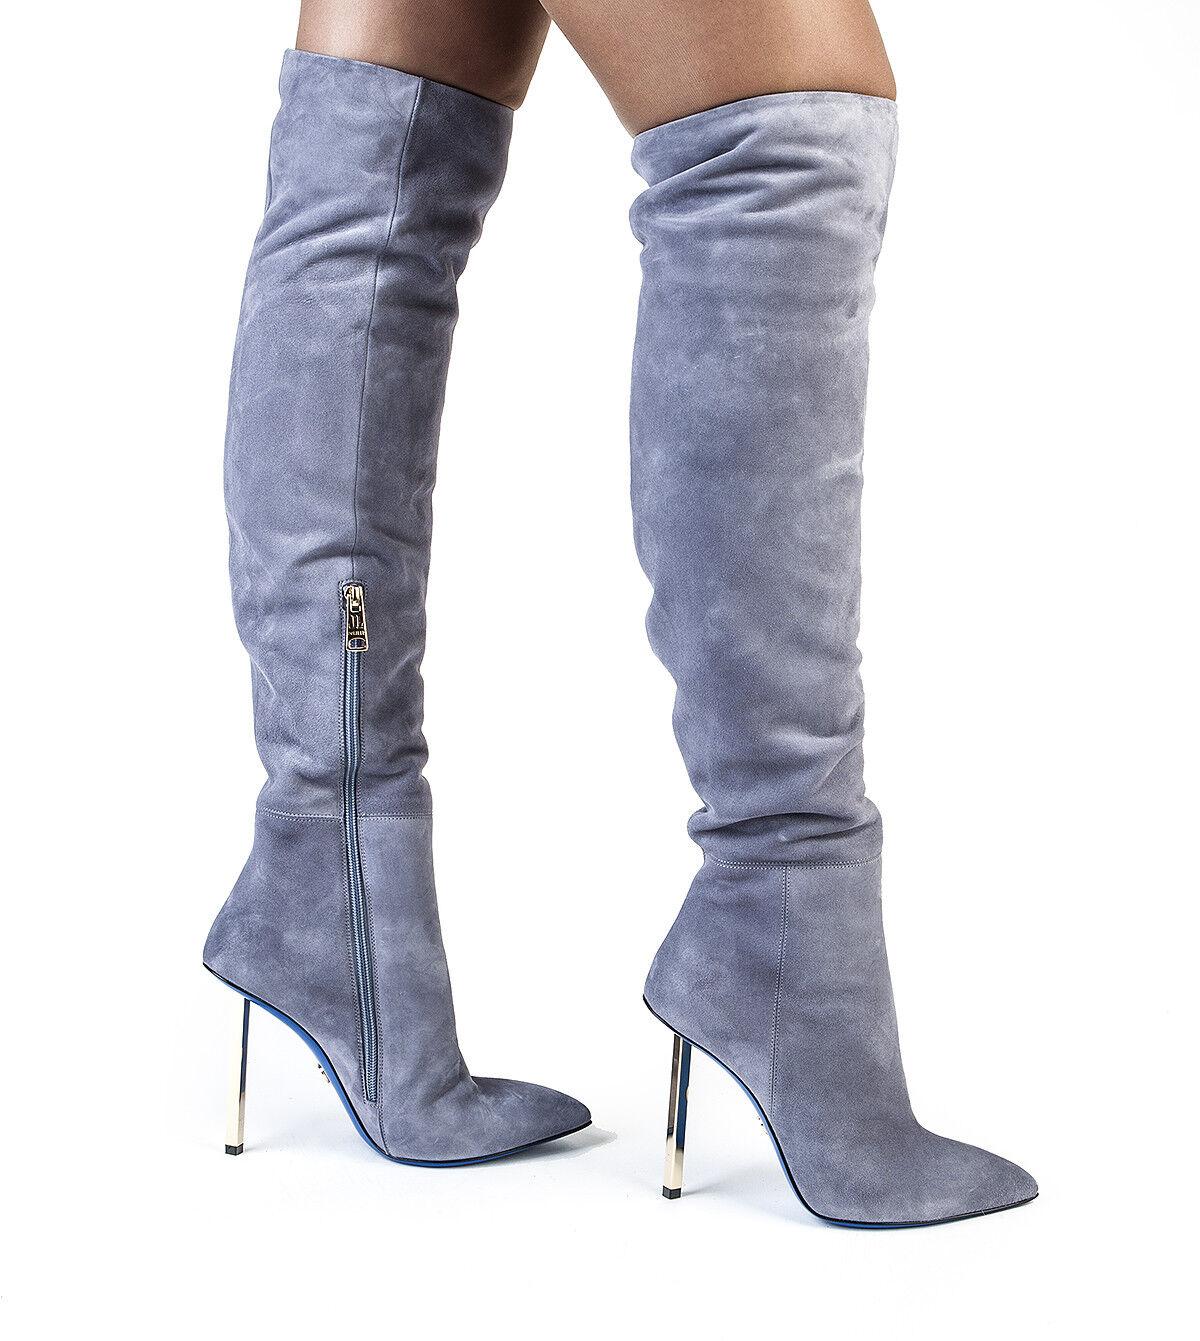 Authentic Loriblu Suede Italian Designer Collection Boots Sizes 6,7,8,9,10